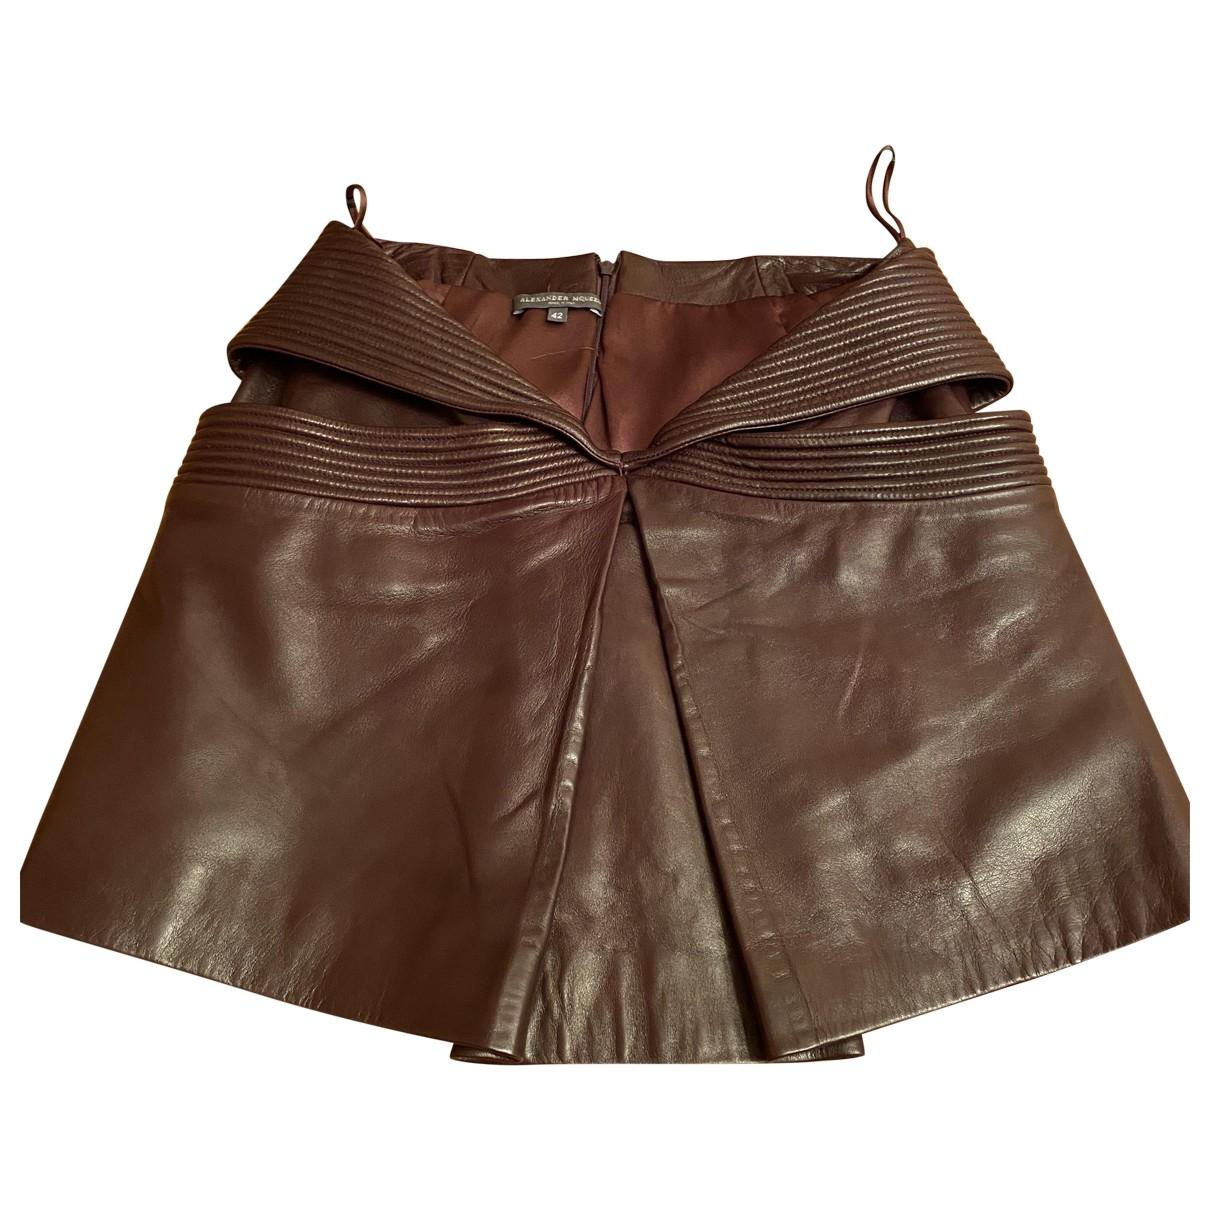 Alexander Mcqueen - Jupe   pour femme en cuir - marron